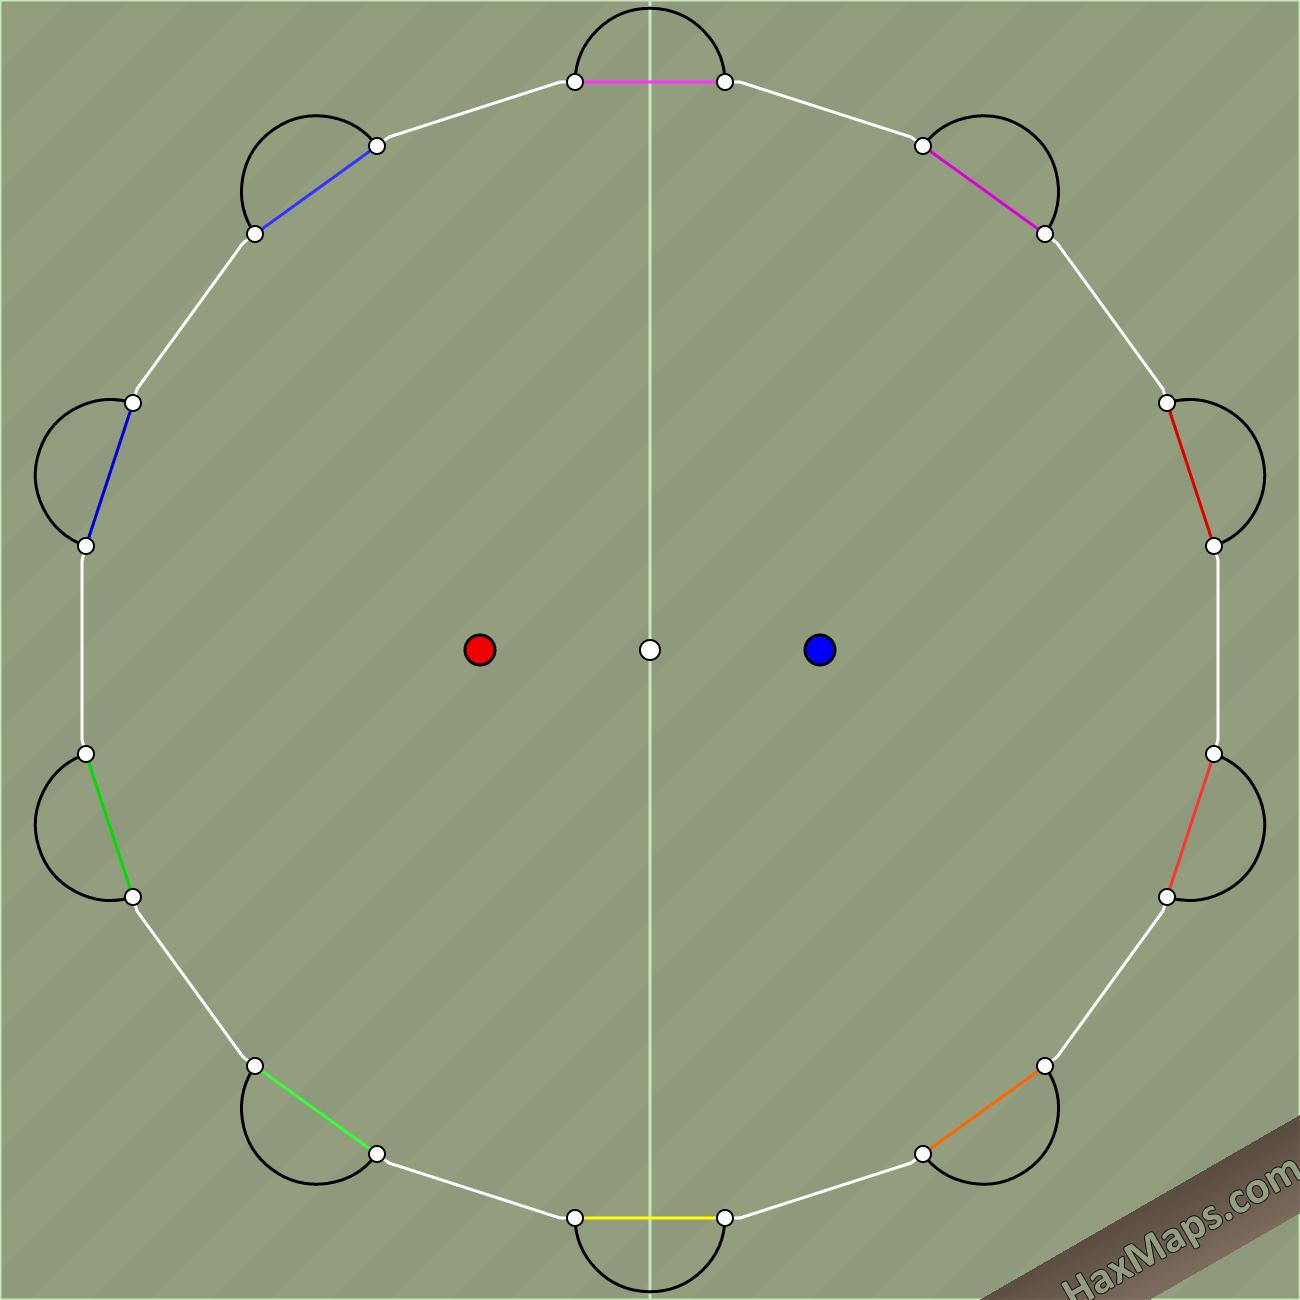 hax ball maps   10 MAN BY RAMBO